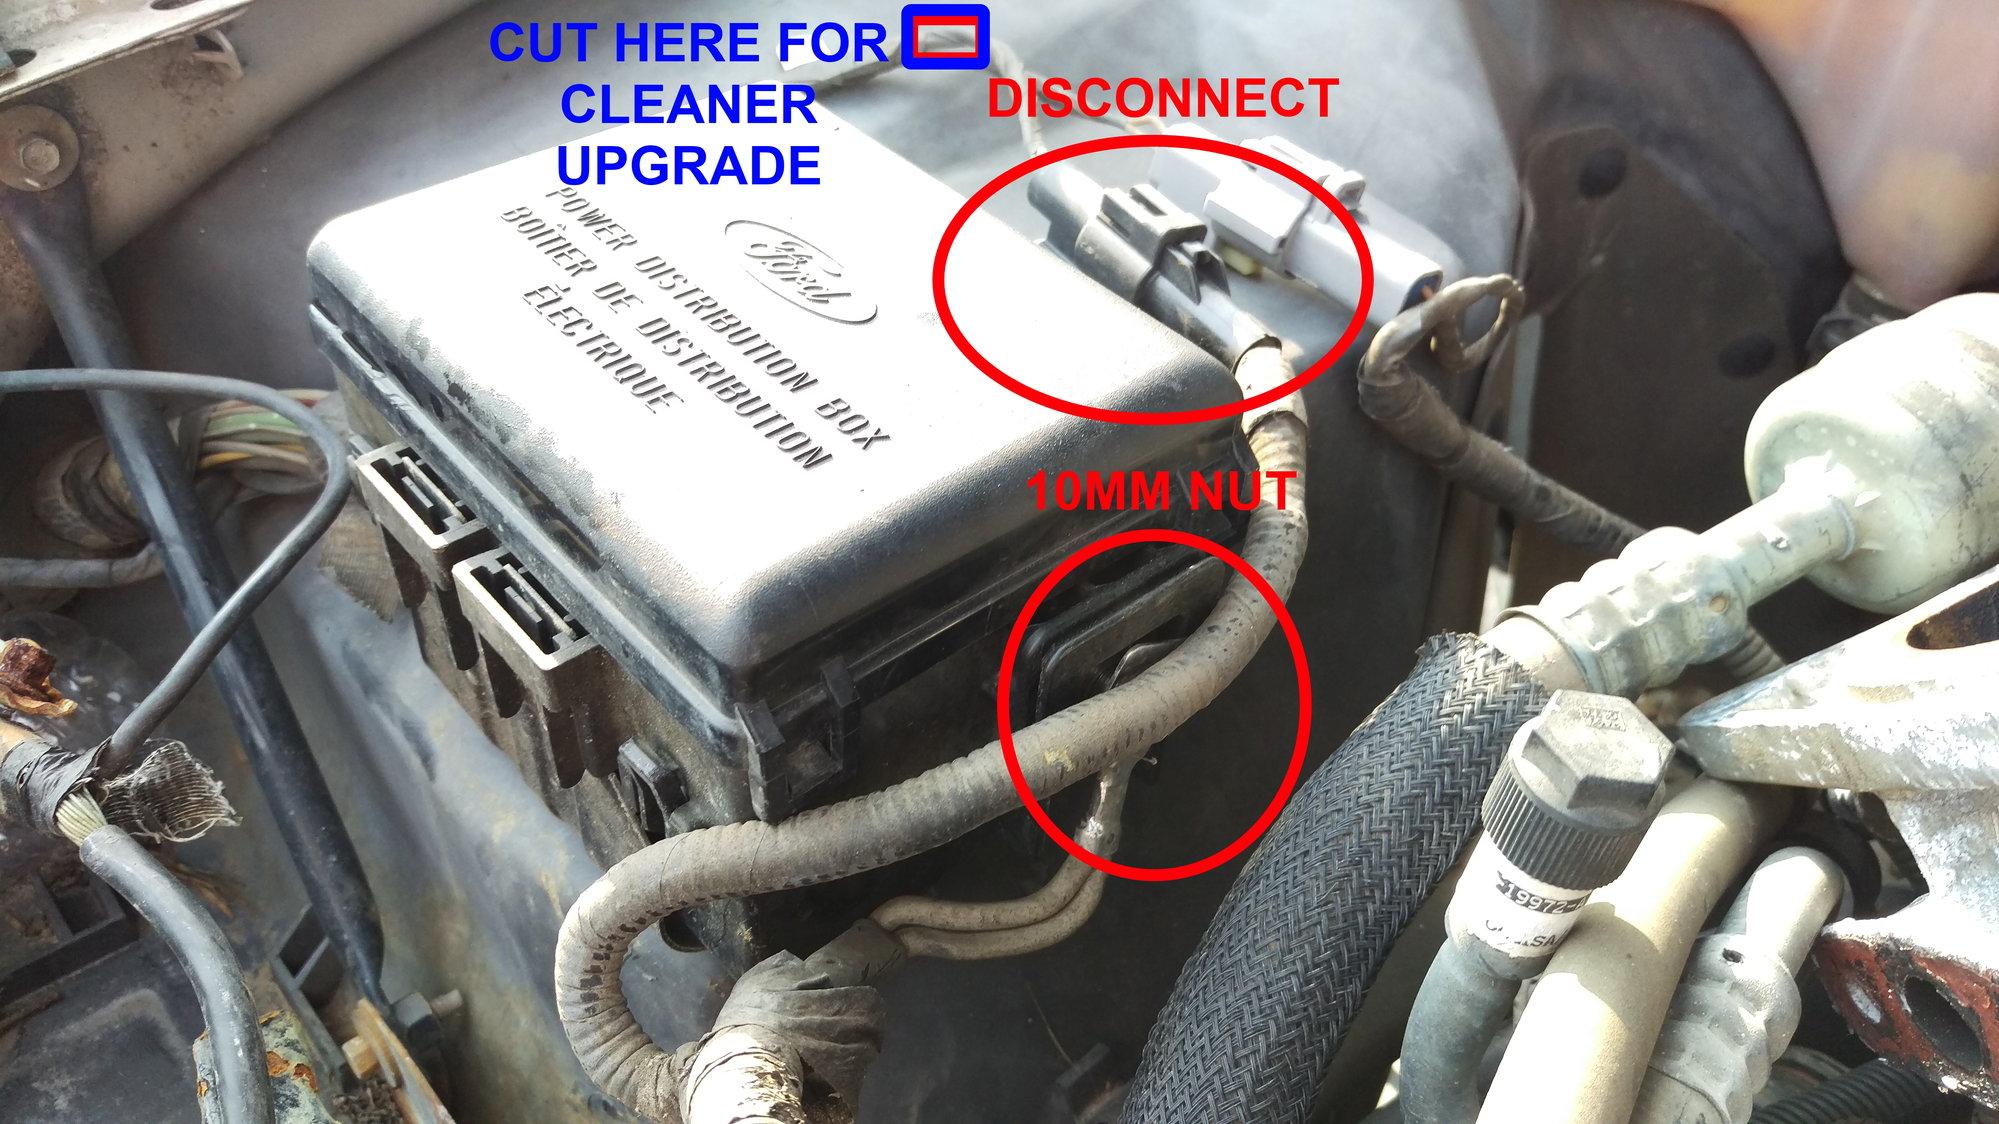 130a 3g Alternator Upgrade On 69 73l Idi Guide Ford Truck Wiring Harness Imag3869 8ca2ae7794e1b638cb7b8b27628eaaafa60484ca